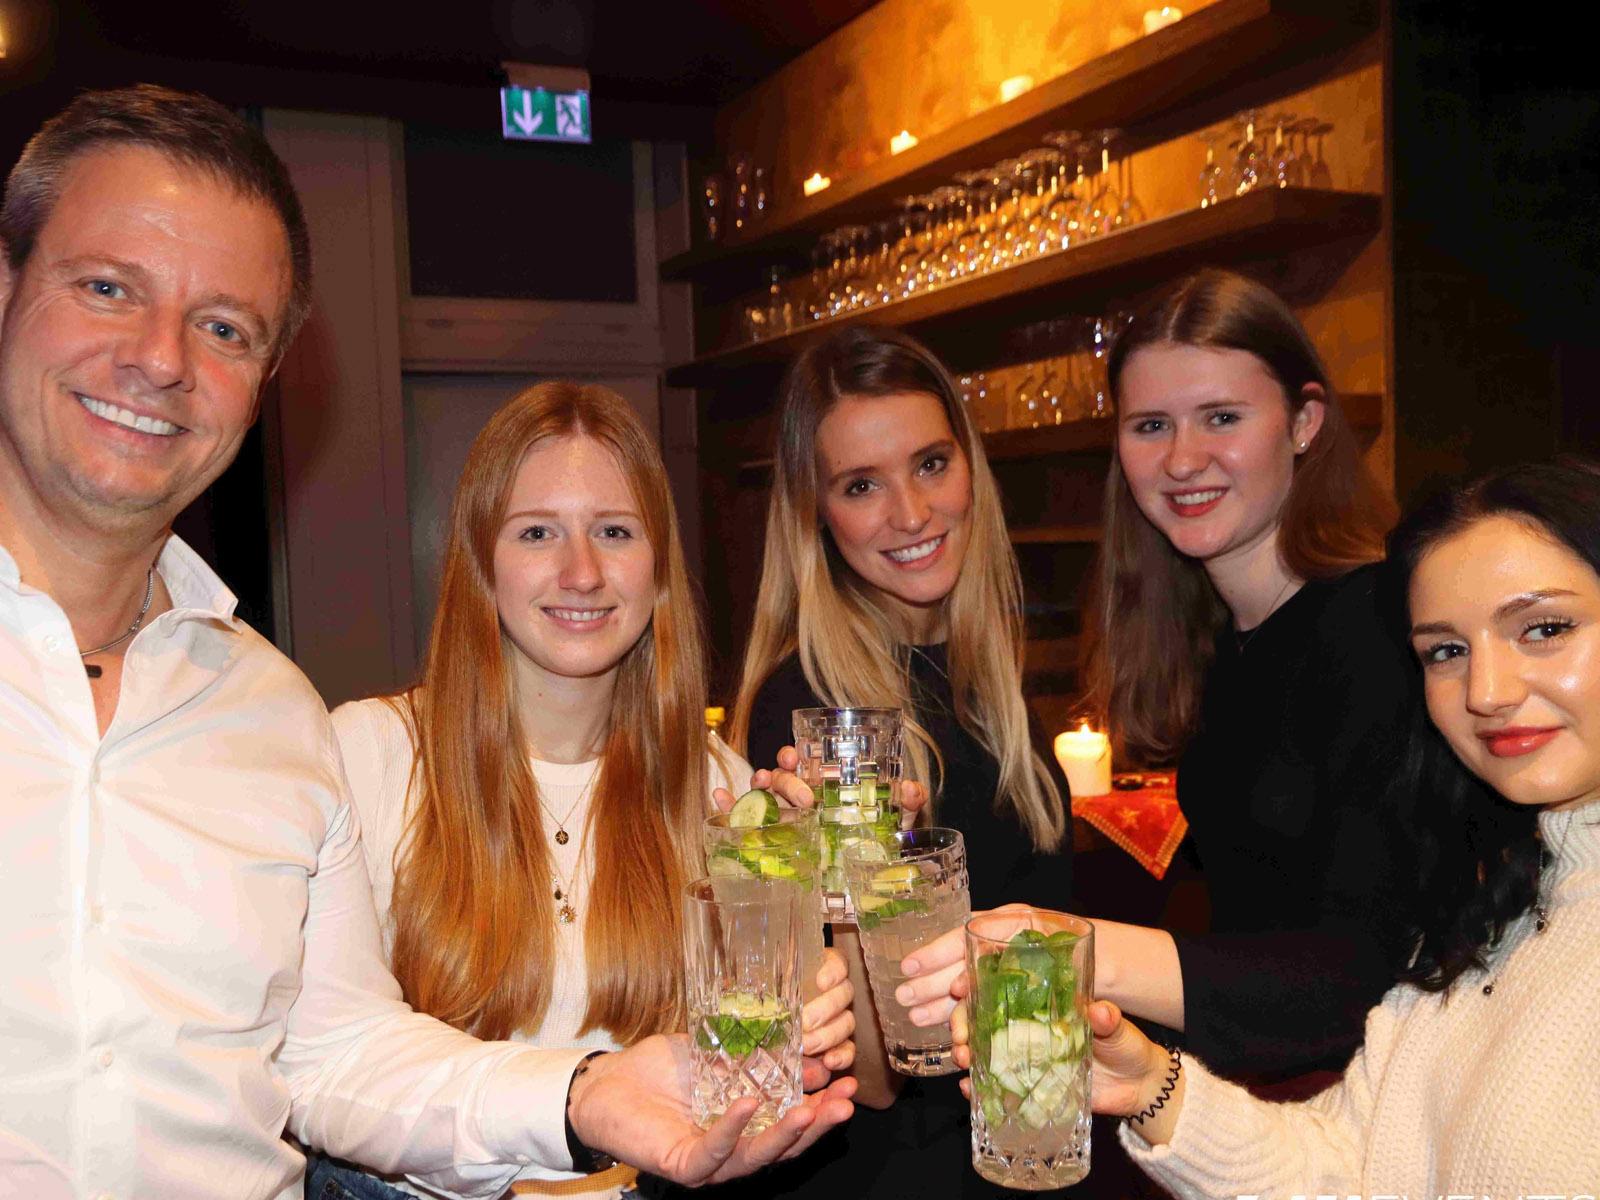 5 Personen feiern im Kino mit Gin Tonic